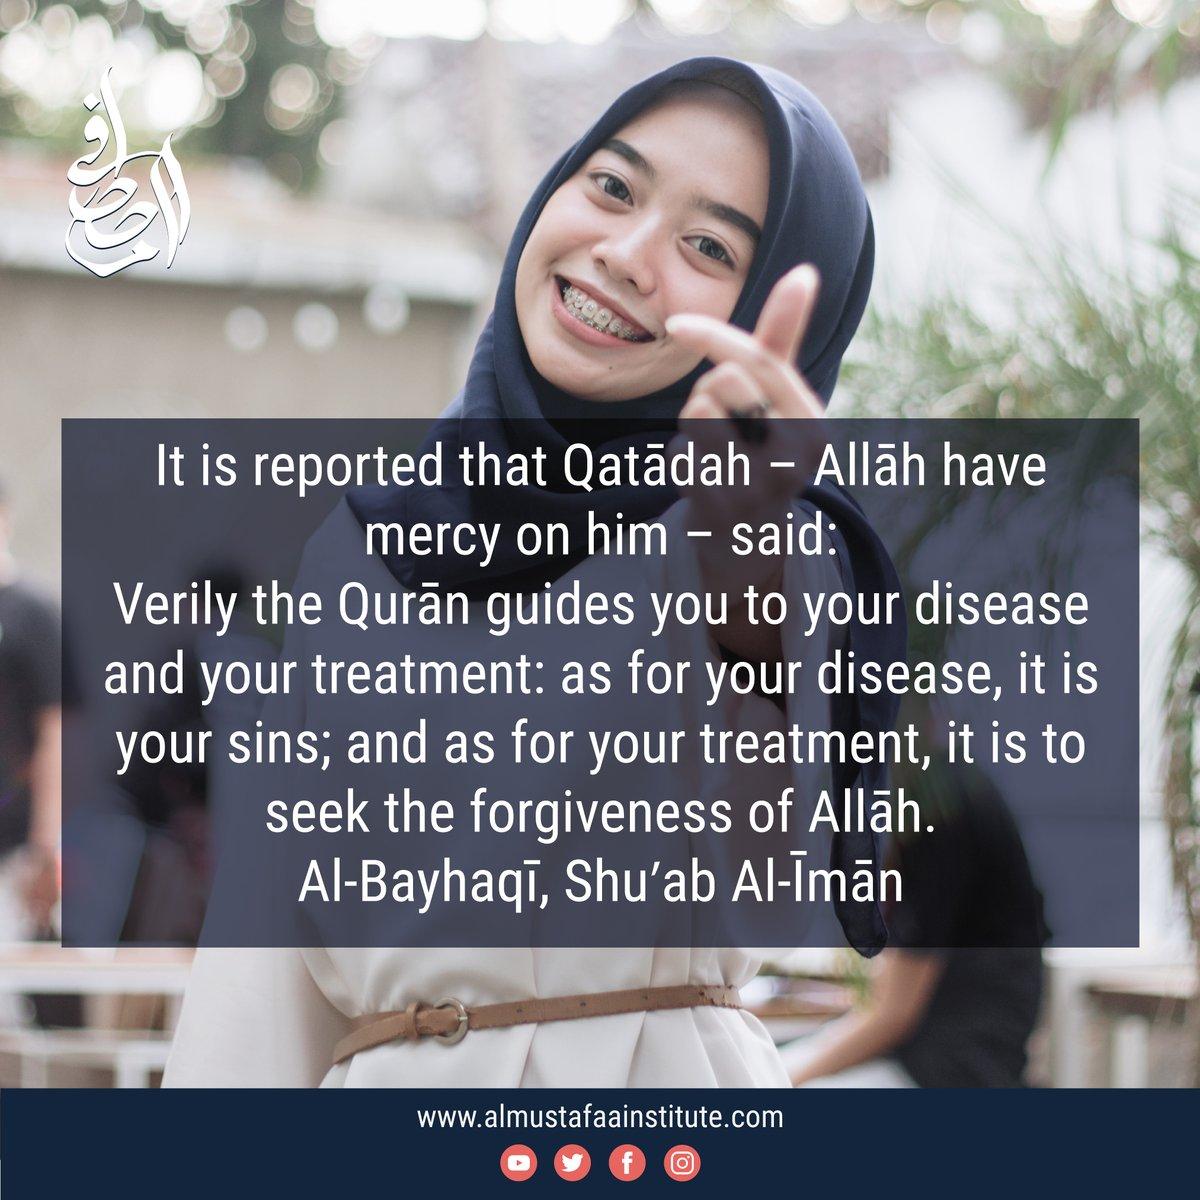 It is reported that Qatādah – Allāh have mercy on him – said:  #islamiceducation #islamiccourses #arabiccourses #islamiclearning #islam #ilm #hadith #quran #islam #knowledge #arabic #islamicunderstanding  #fiqh #aqeedah https://t.co/trXcjklgNJ